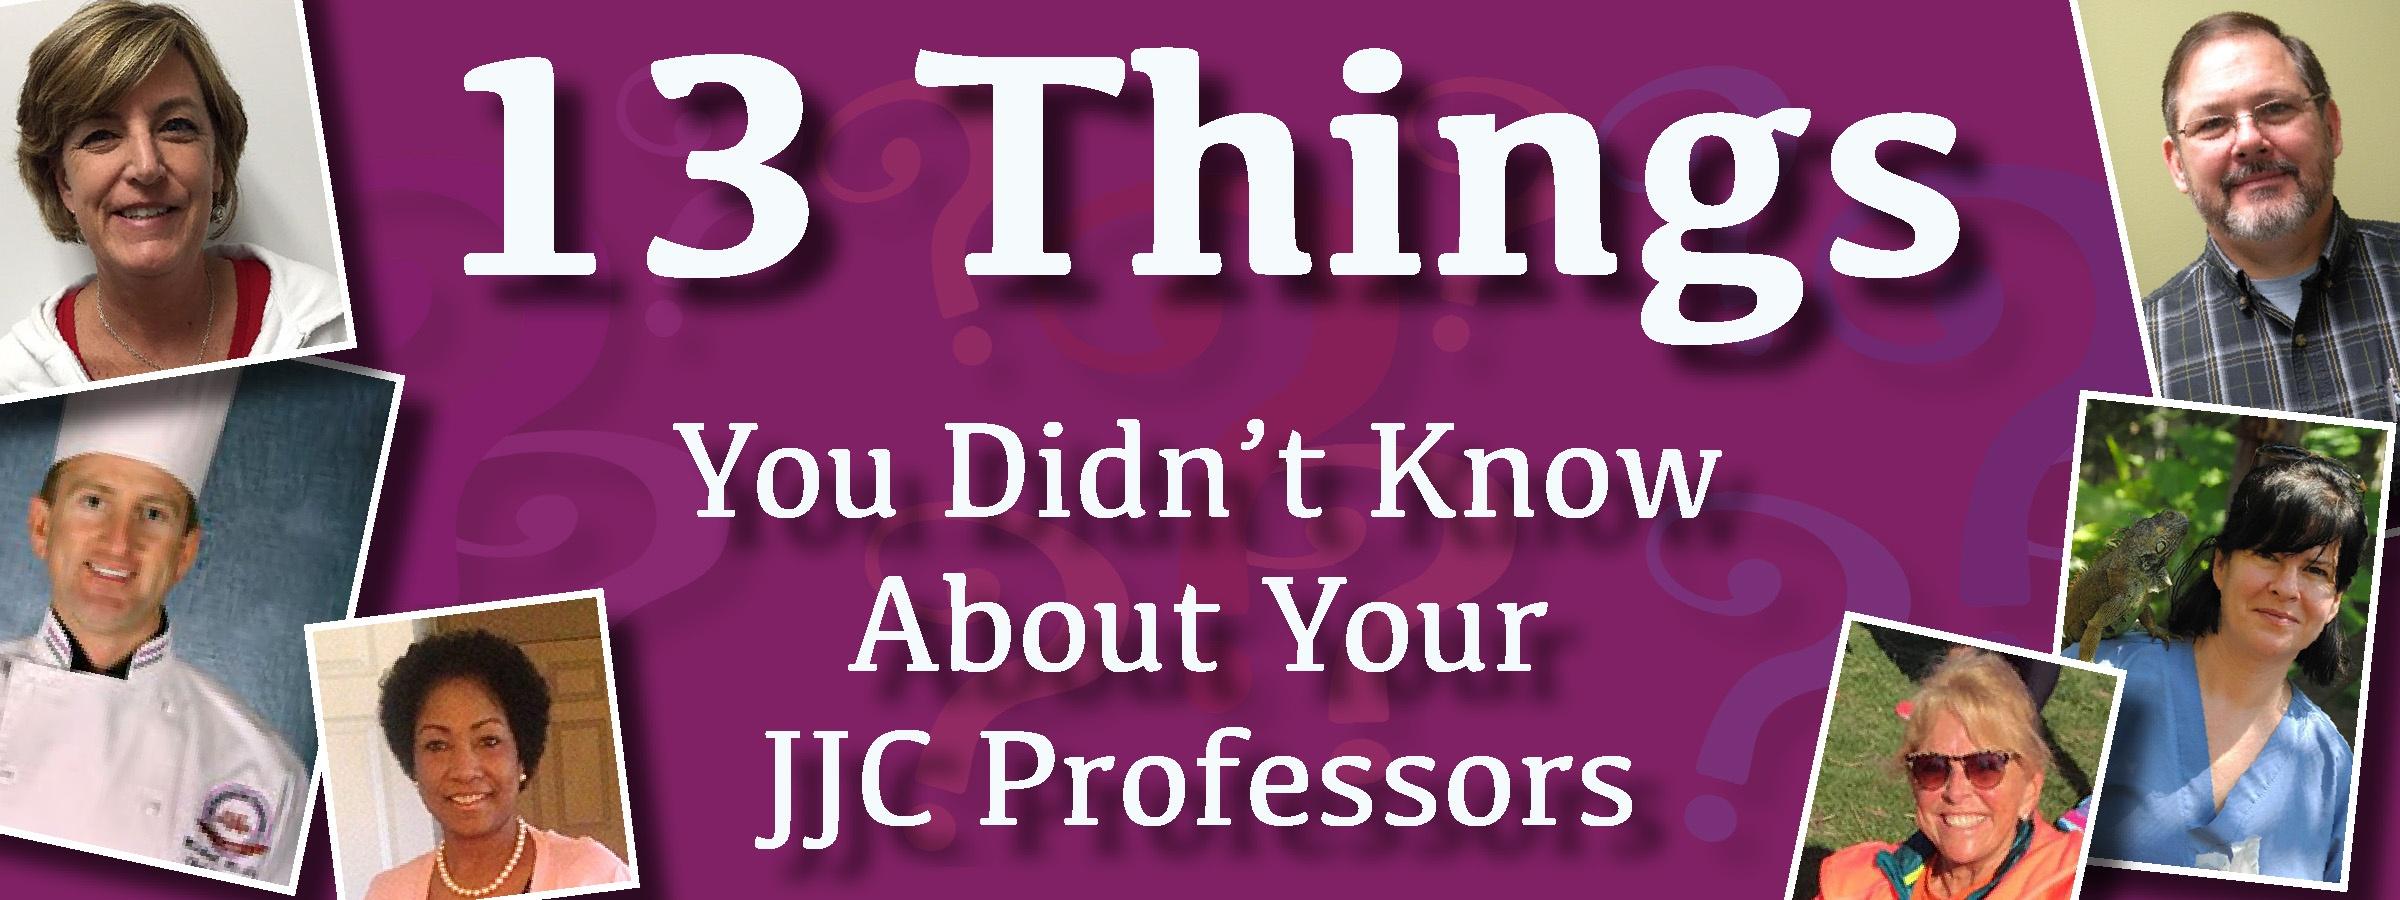 13professors.jpg